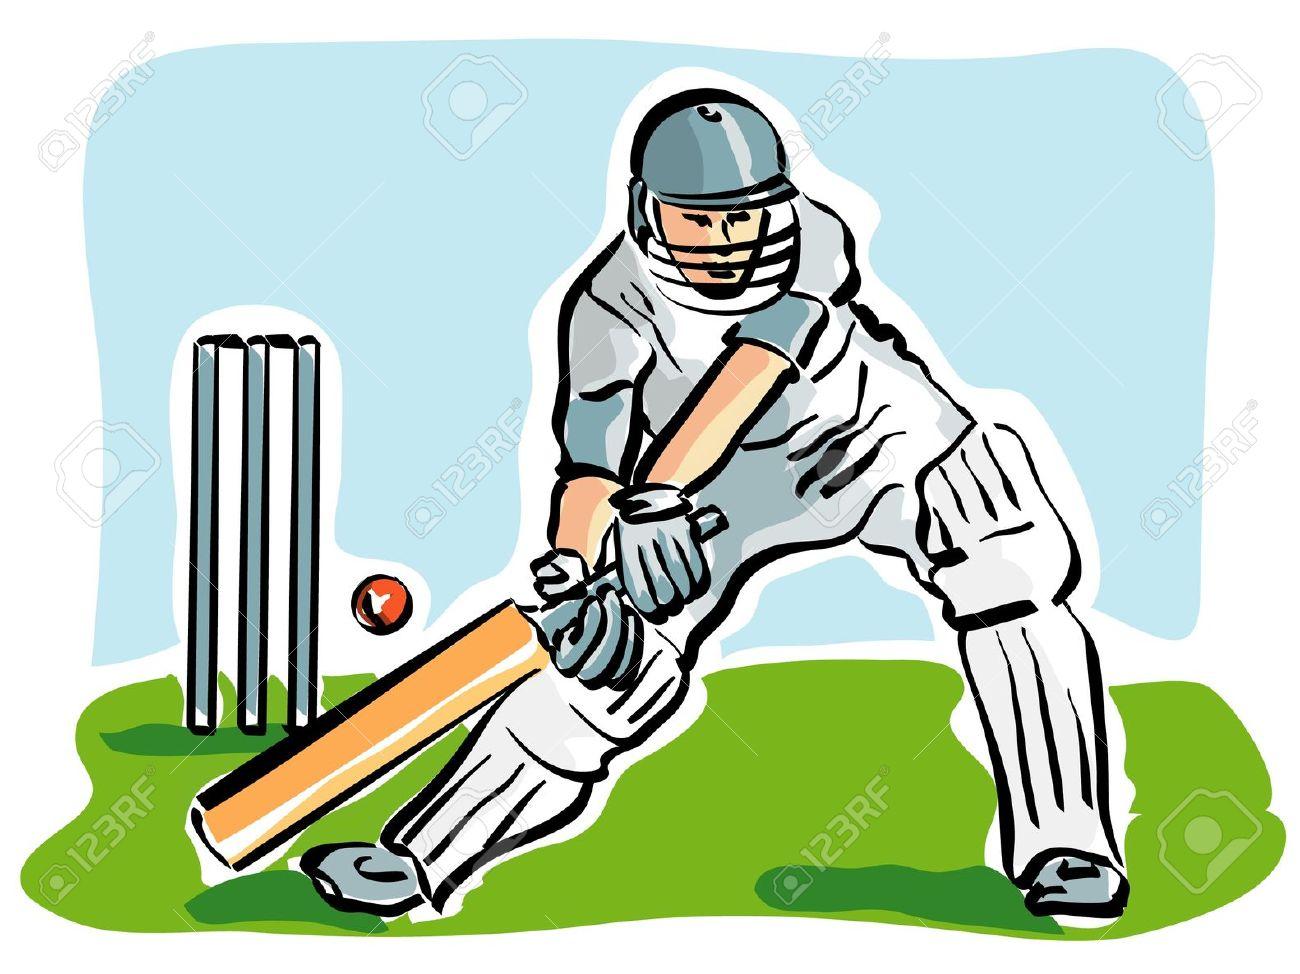 Cricket clipart cricket team pencil and in color.